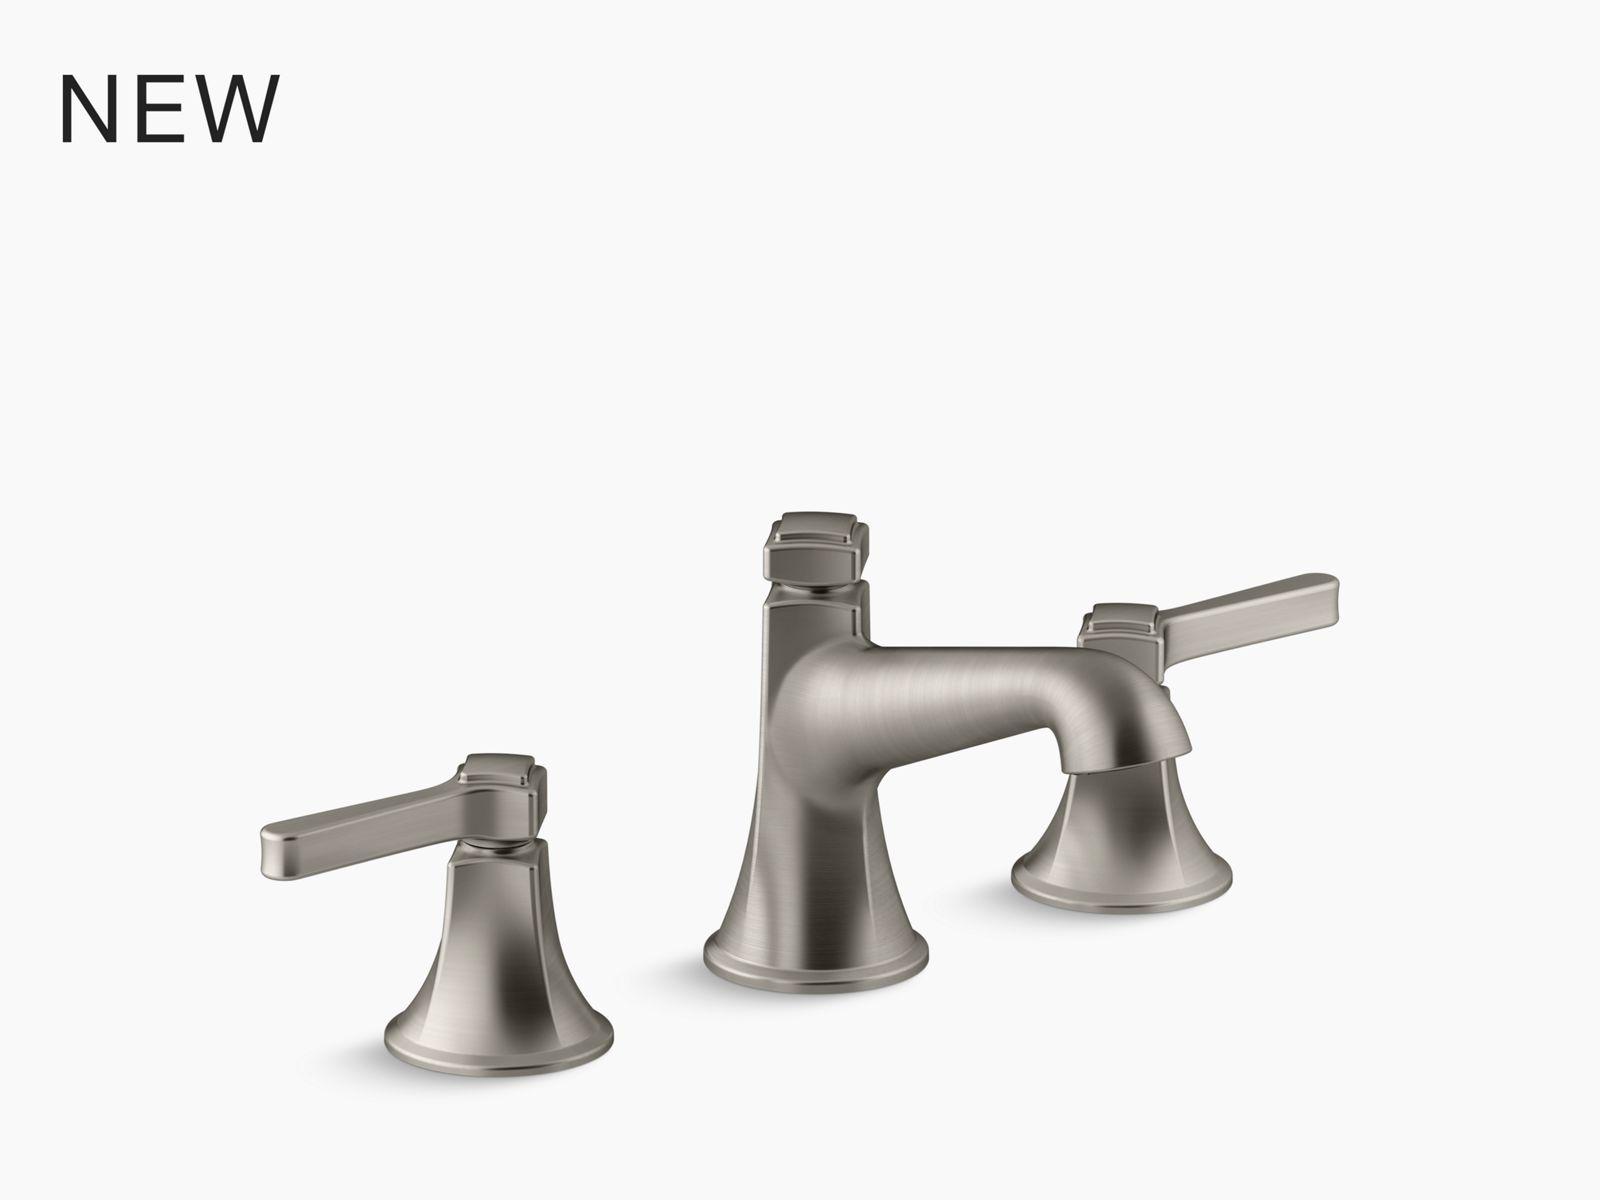 Cimarron DropIn Sink with 4Inch Centers  K23514  KOHLER